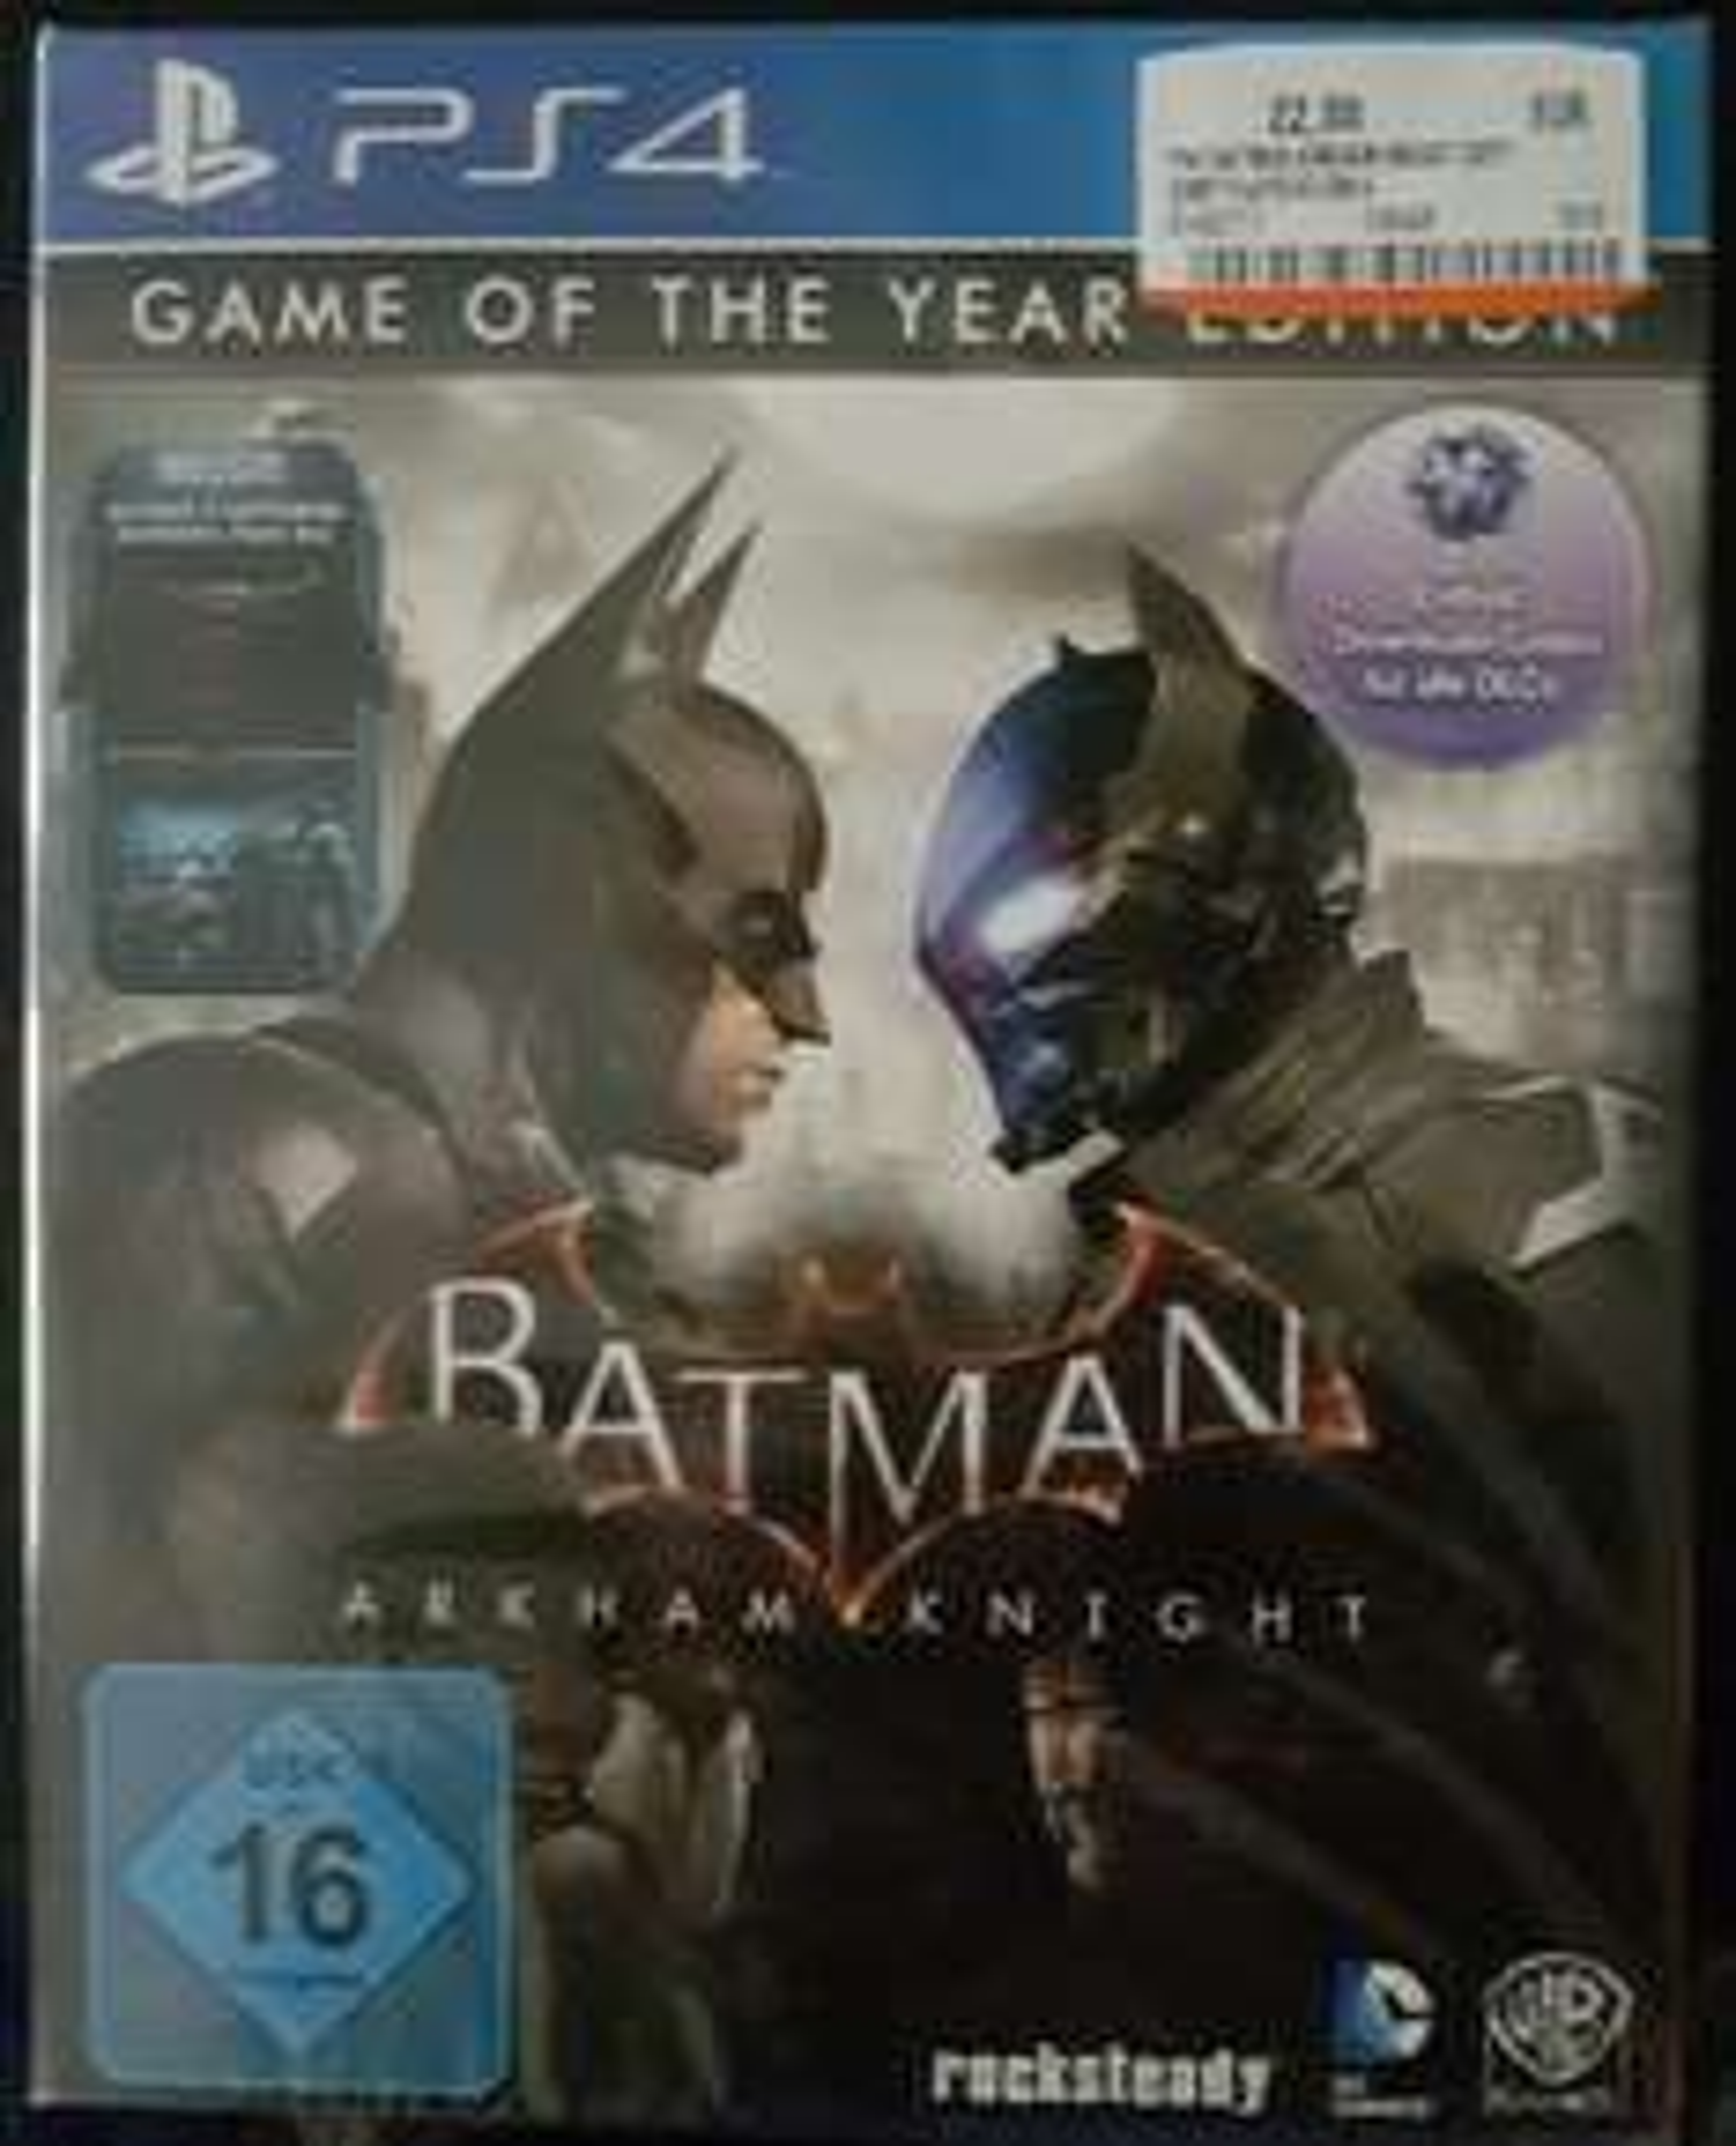 [Lokal] [MediaMarkt] [Berlin-Waltersdorf] Batman: Arkham Knight - Game of the Year Edition (PS4) für 22,00 €